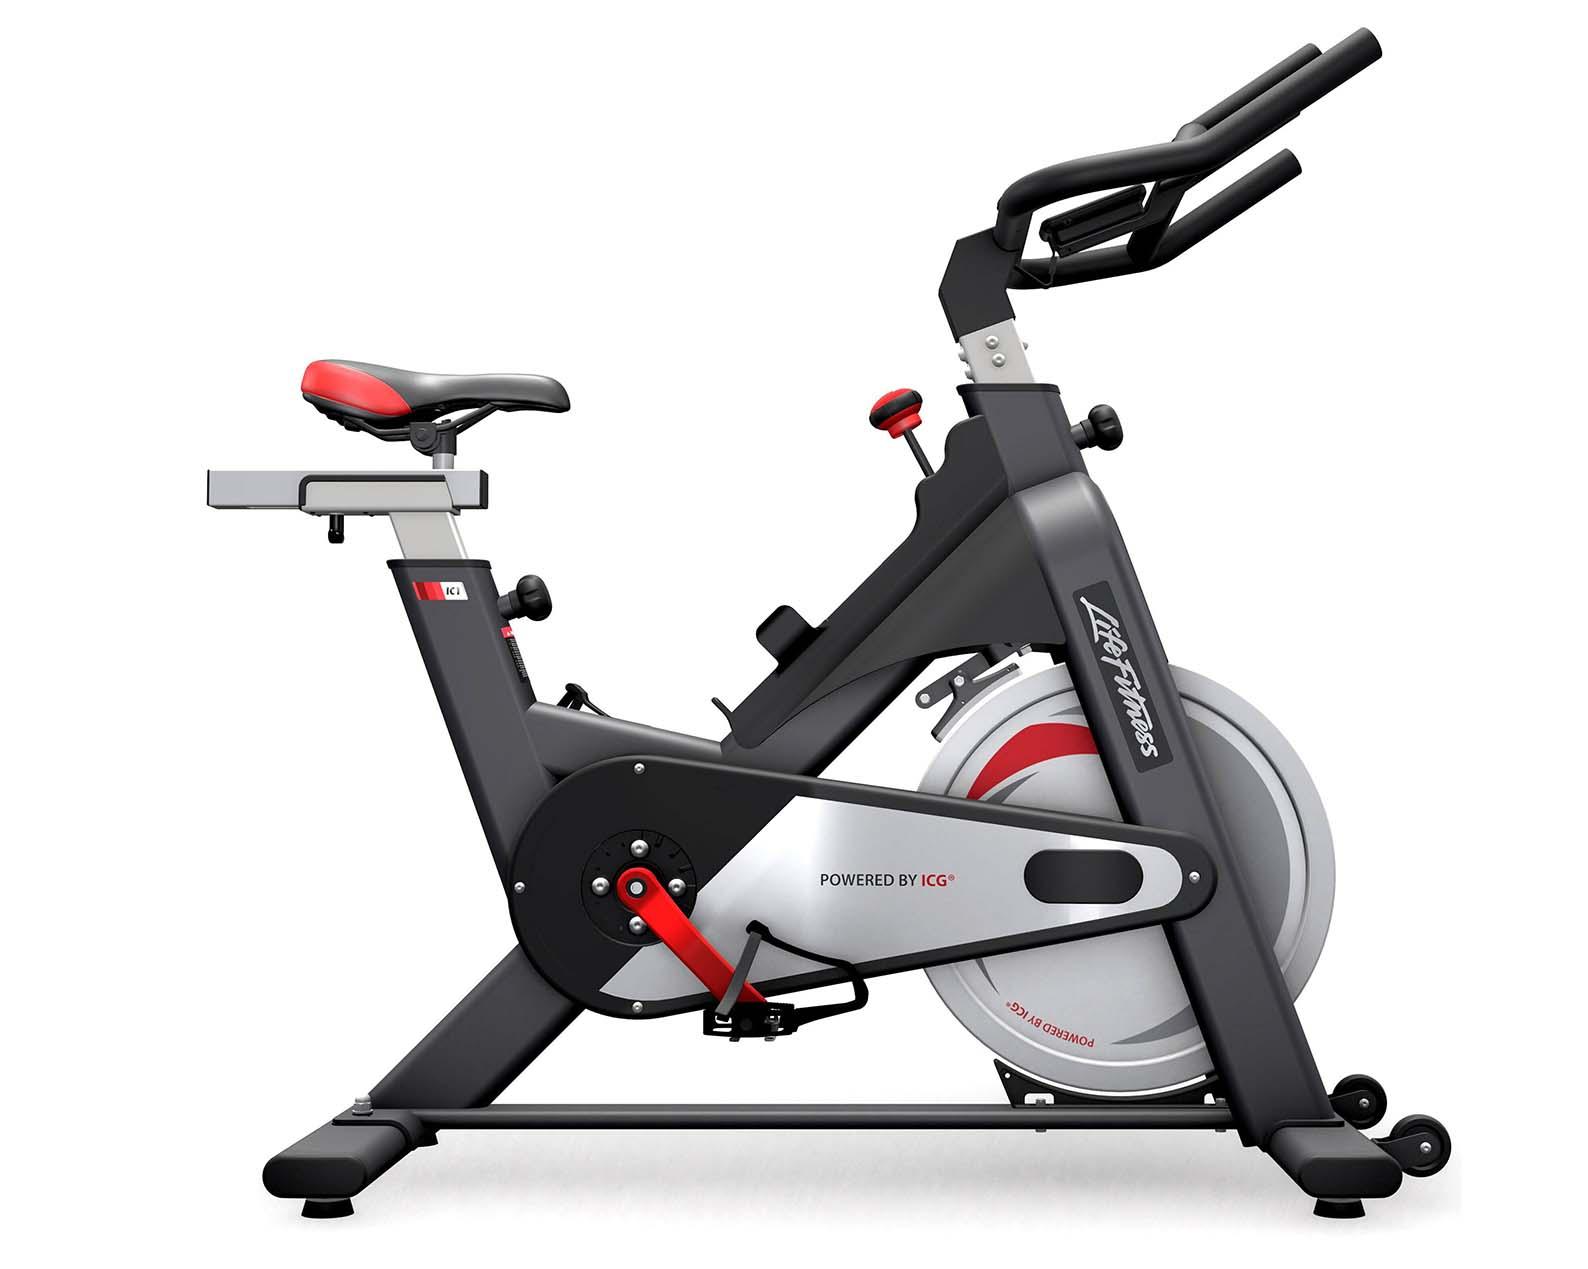 life-fitness-icg-tomahawk-ic1